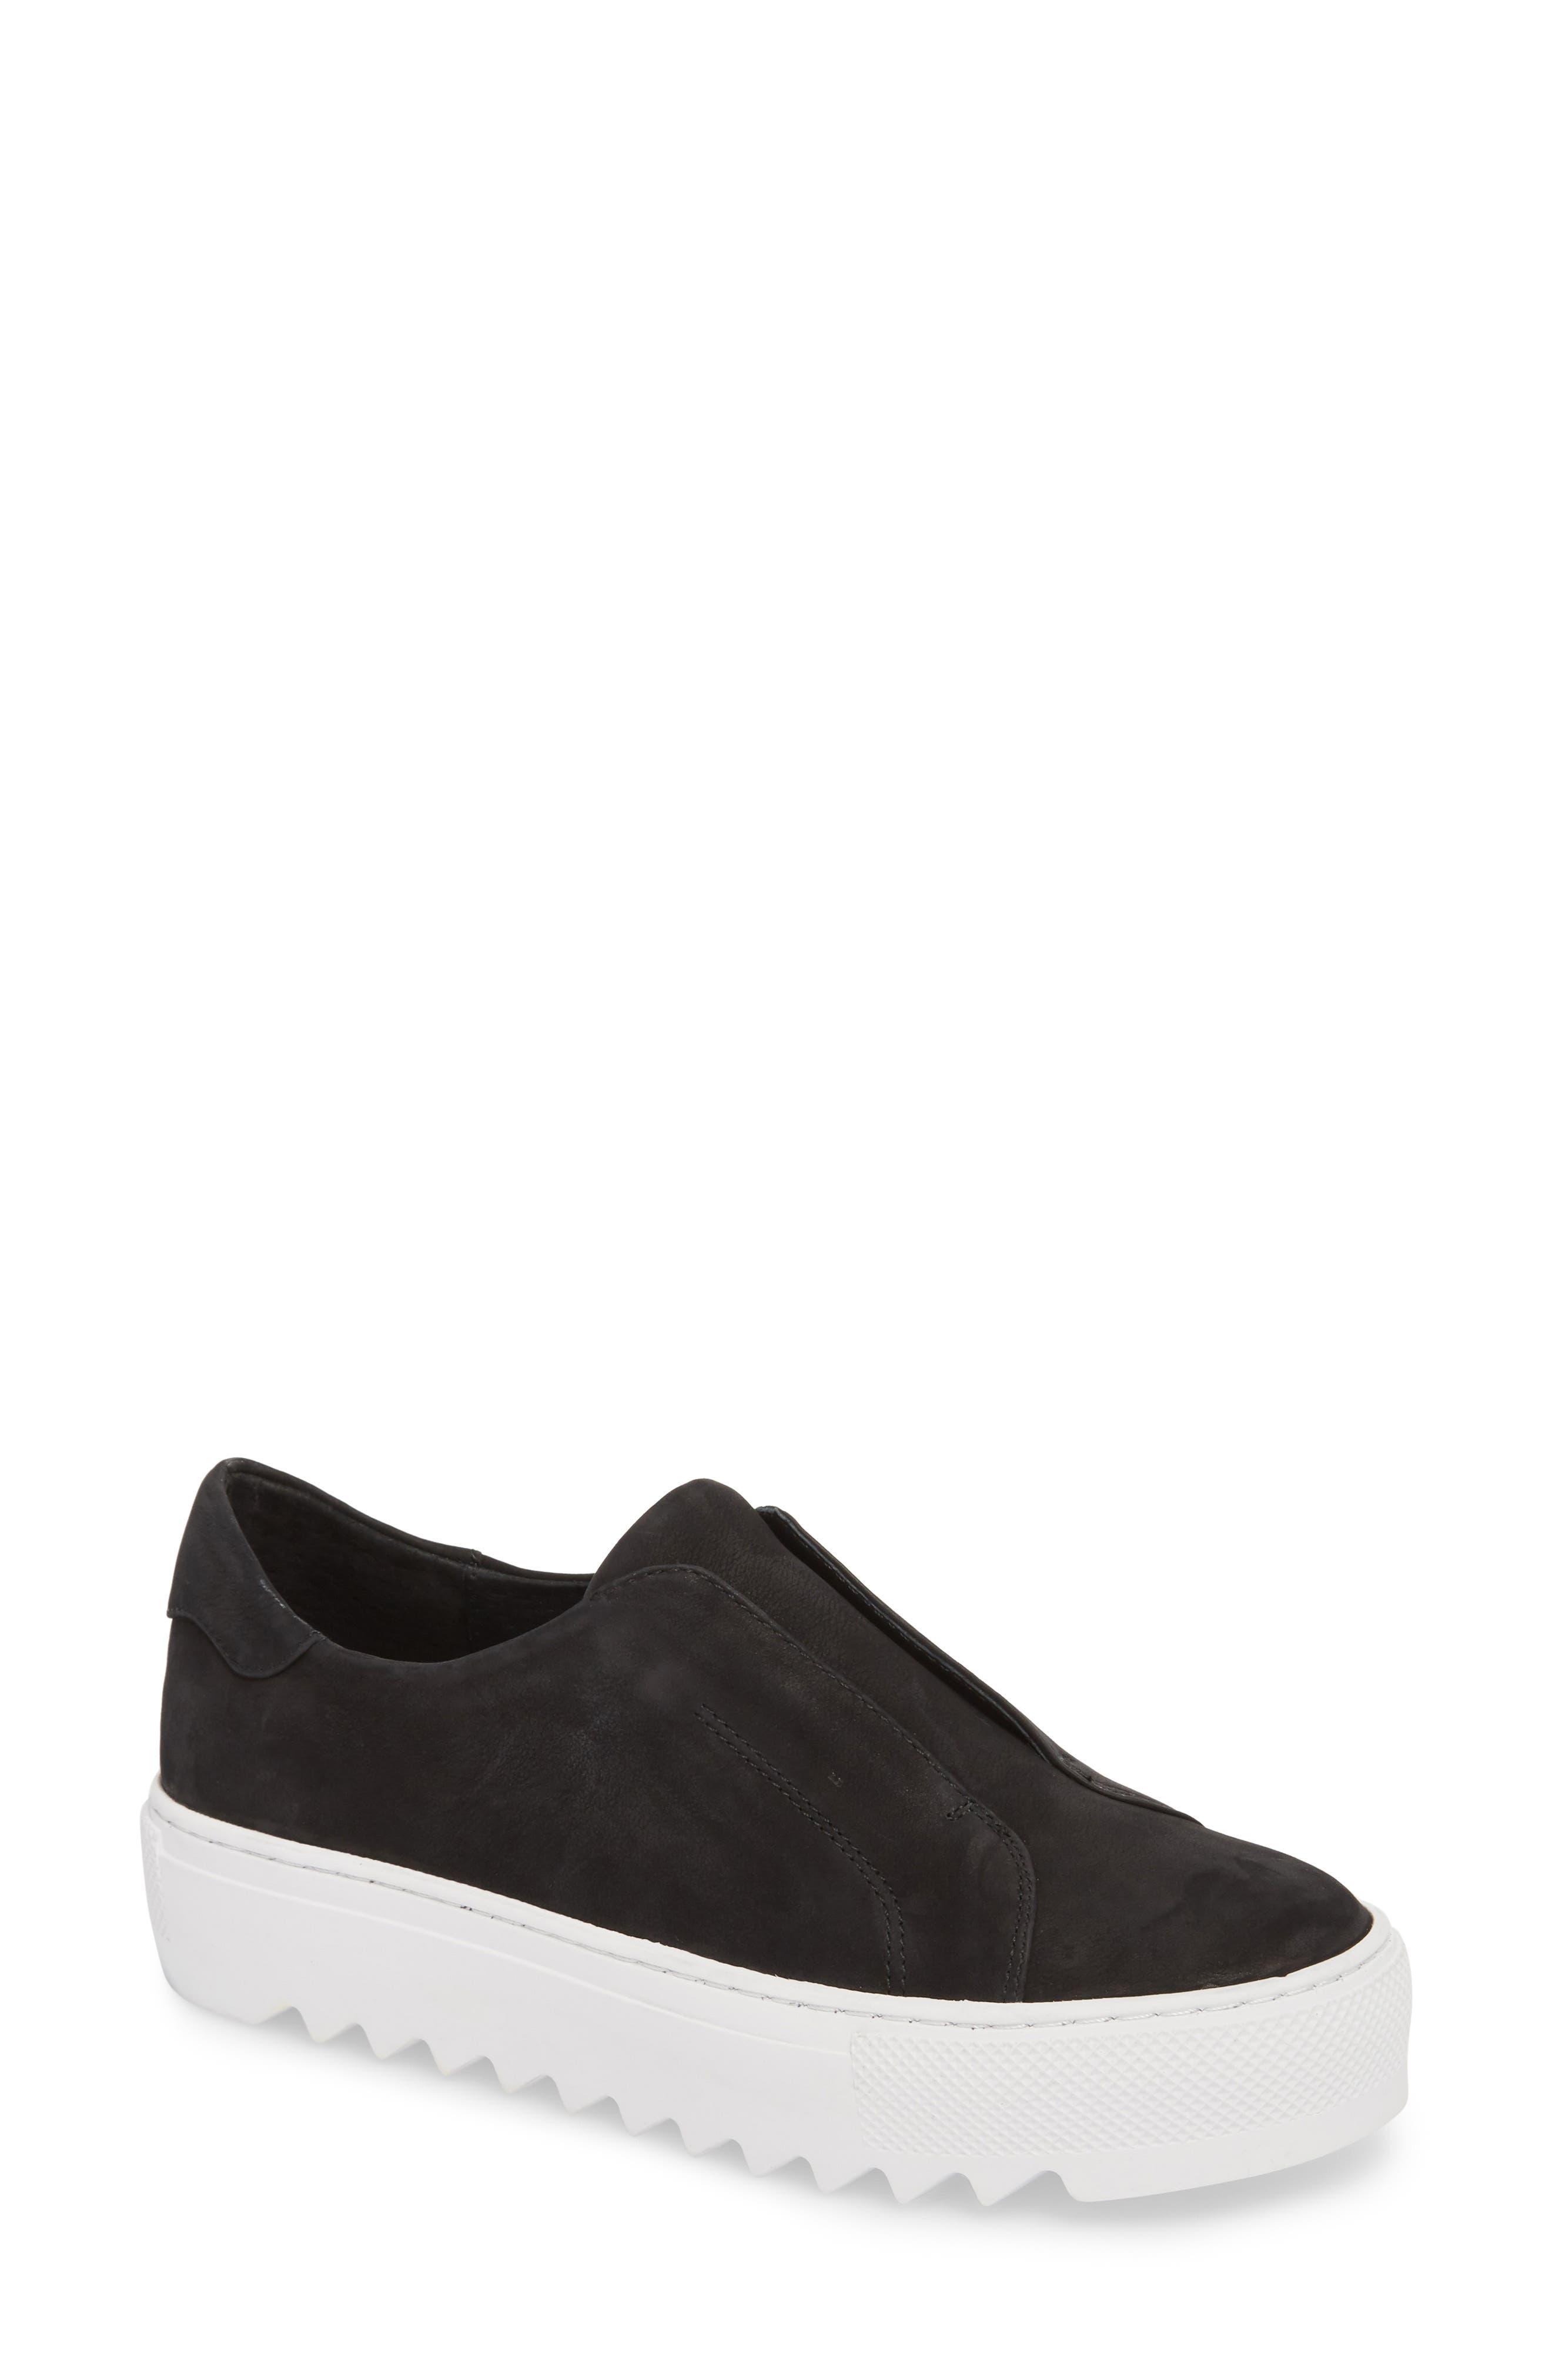 Spazo Slip-On Platform Sneaker,                             Main thumbnail 1, color,                             001